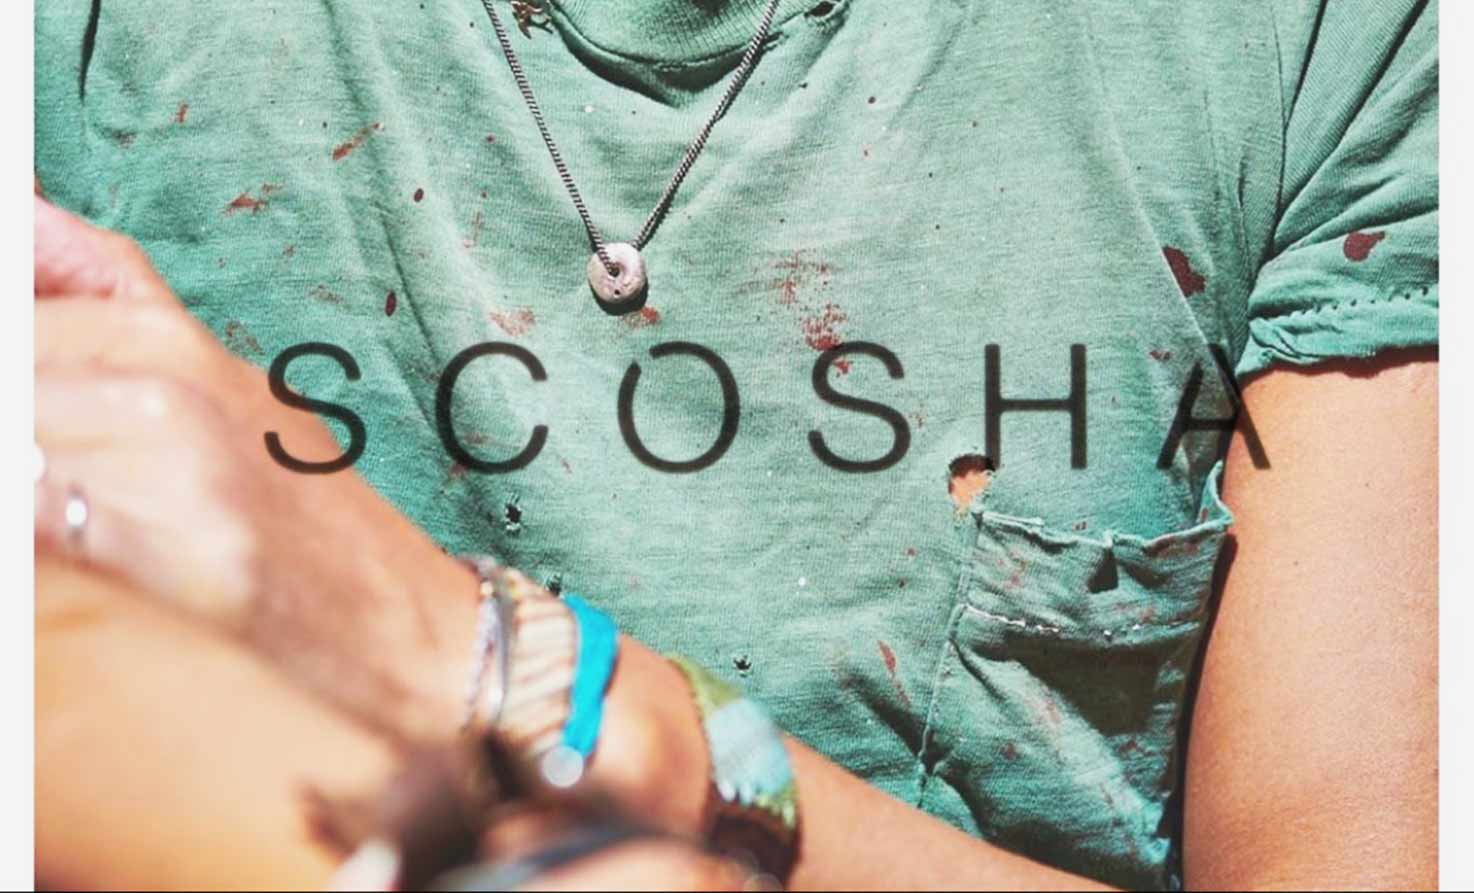 SCOSHA